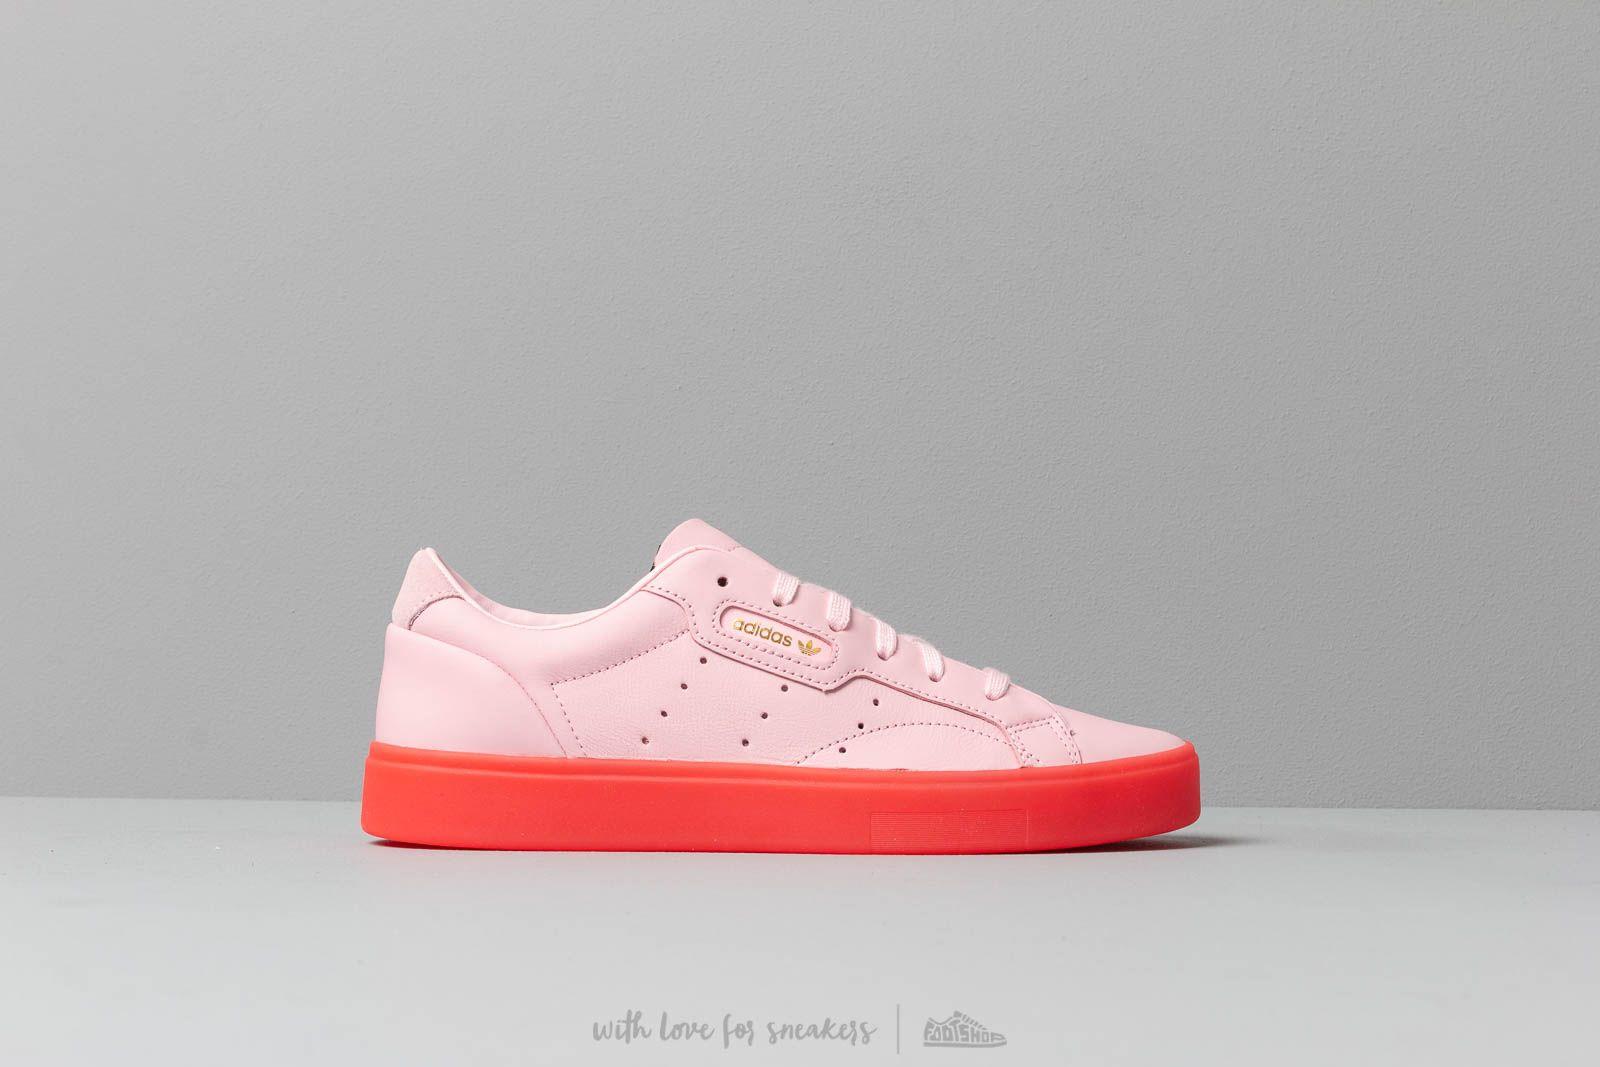 adidas Sleek W Diva Diva Red | Footshop